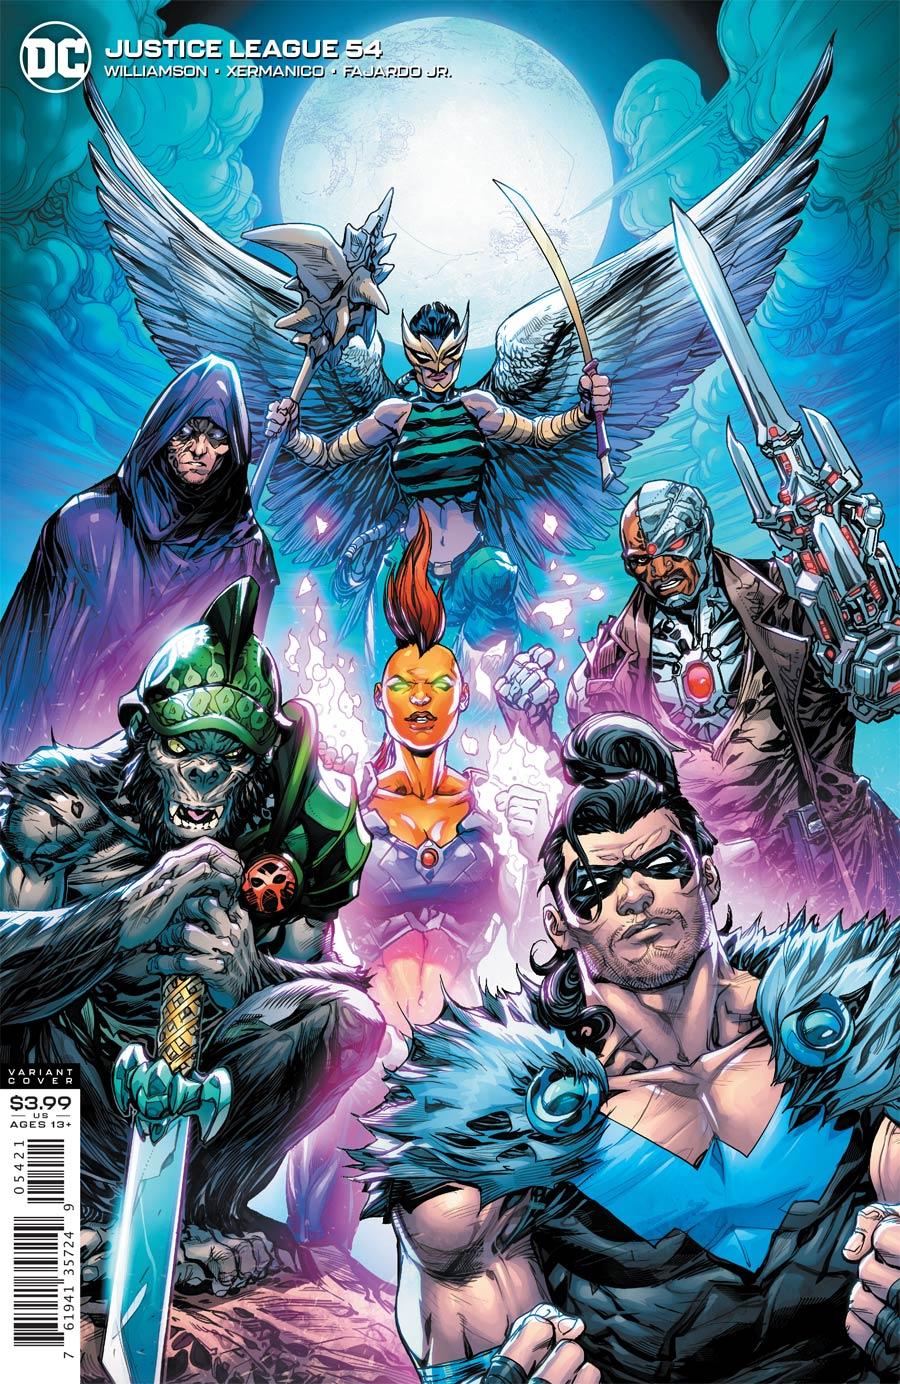 Justice League Vol 4 #54 Cover B Variant Howard Porter Cover (Dark Nights Death Metal Tie-In)